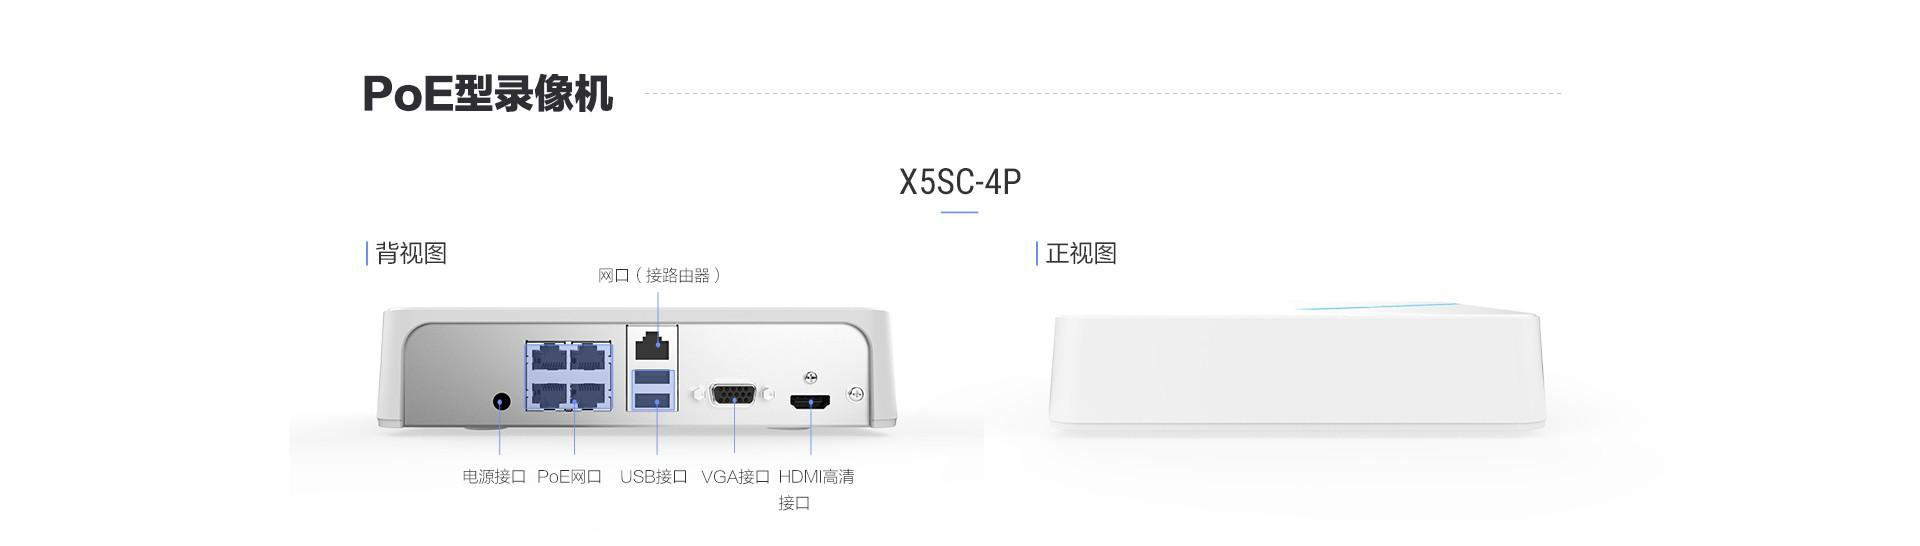 C3T+X5SC-web_23.jpg